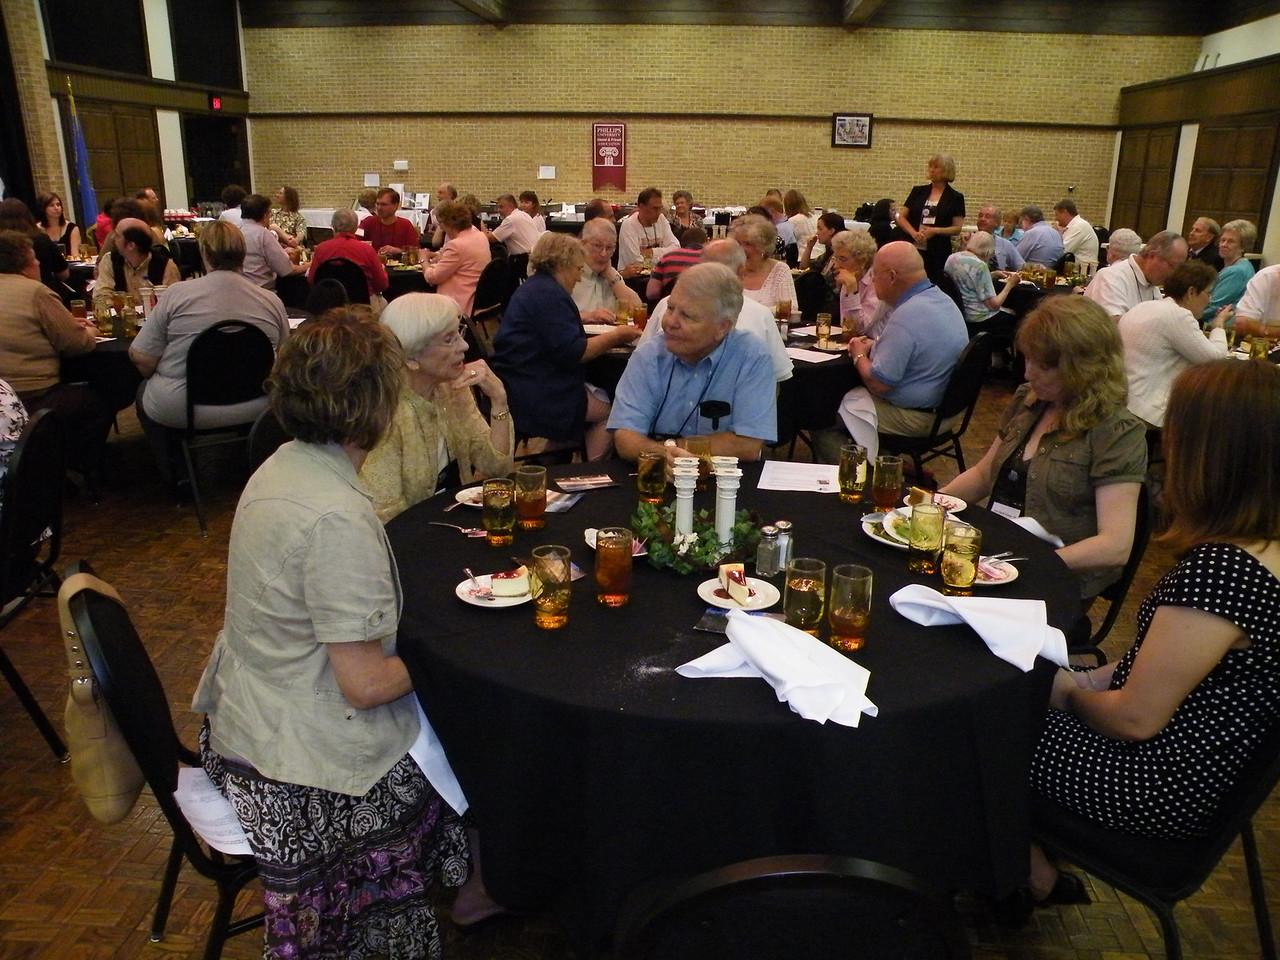 Near table facing camera:  Dorothy Trueblood Elliott '48, Max Jones, and Lori Hunter '86.